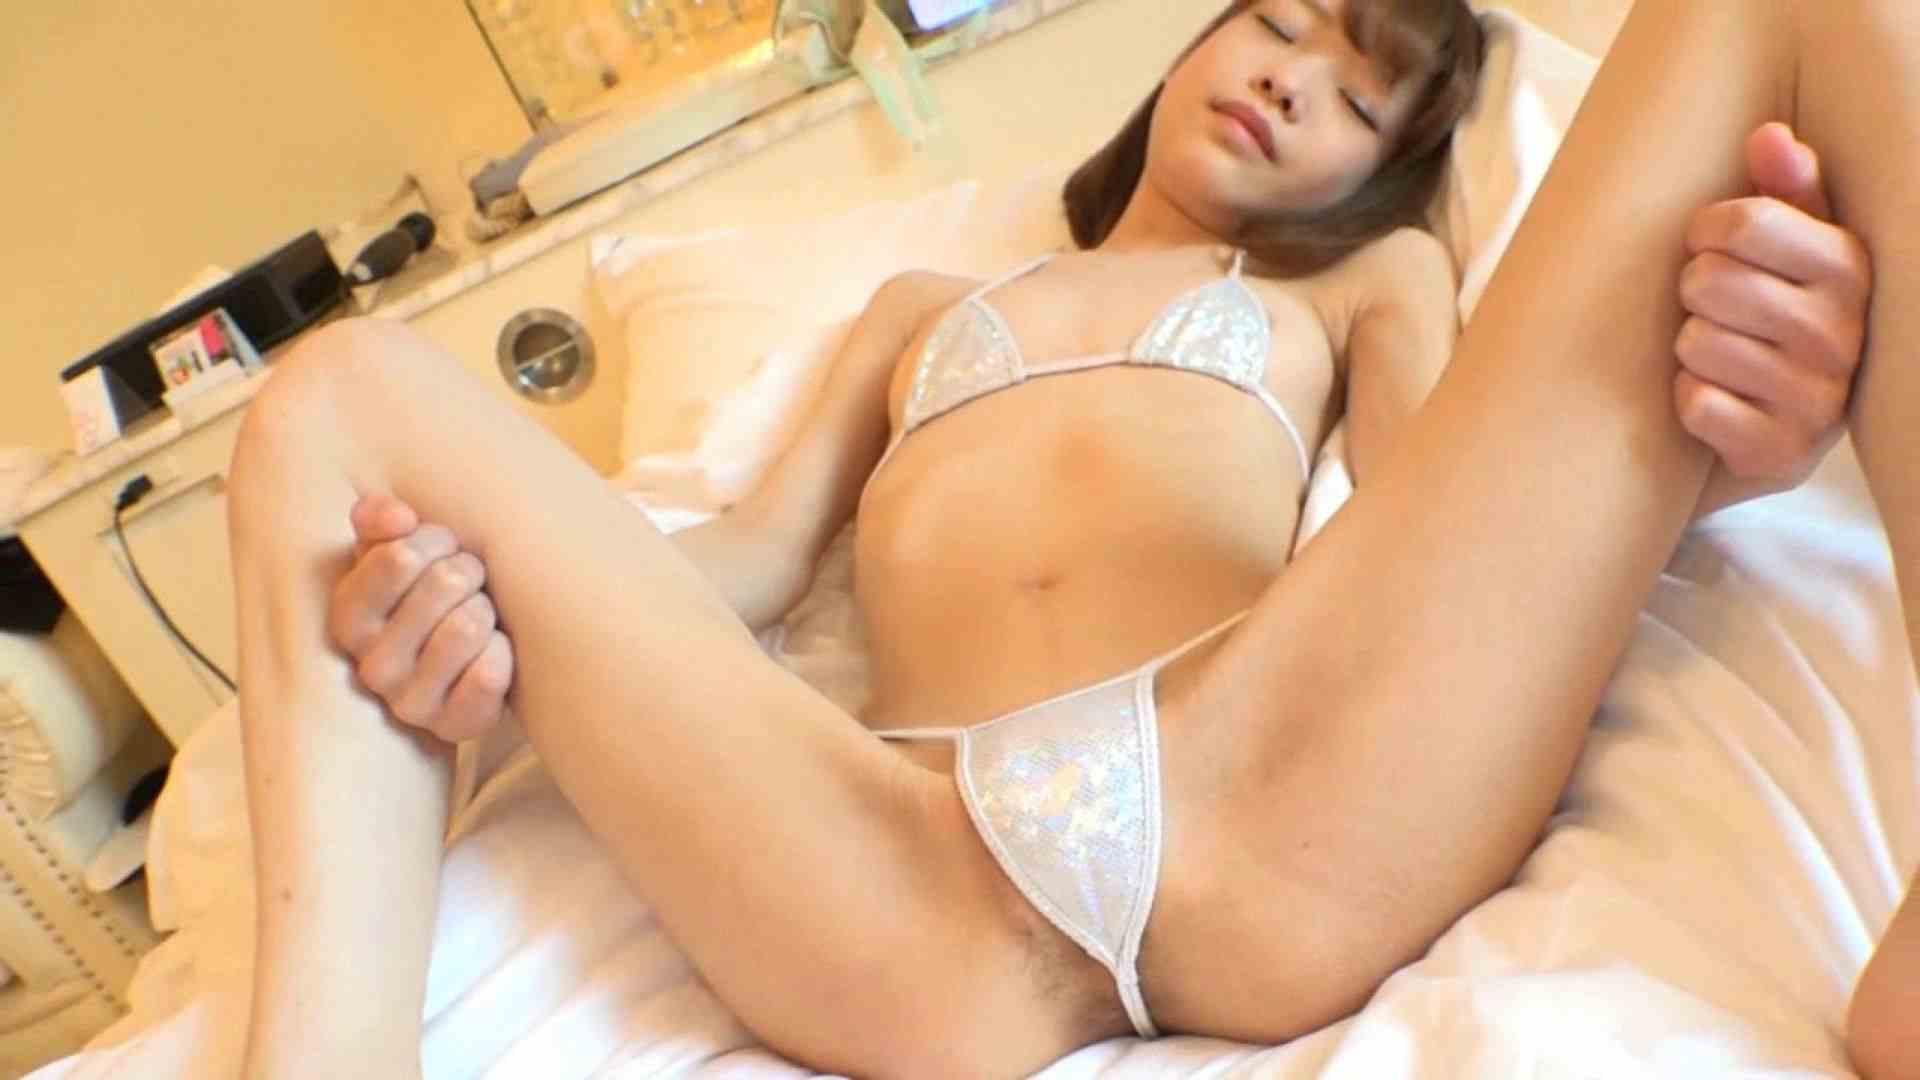 S級厳選美女ビッチガールVol.32 前編 美女丸裸 エロ無料画像 99pic 58